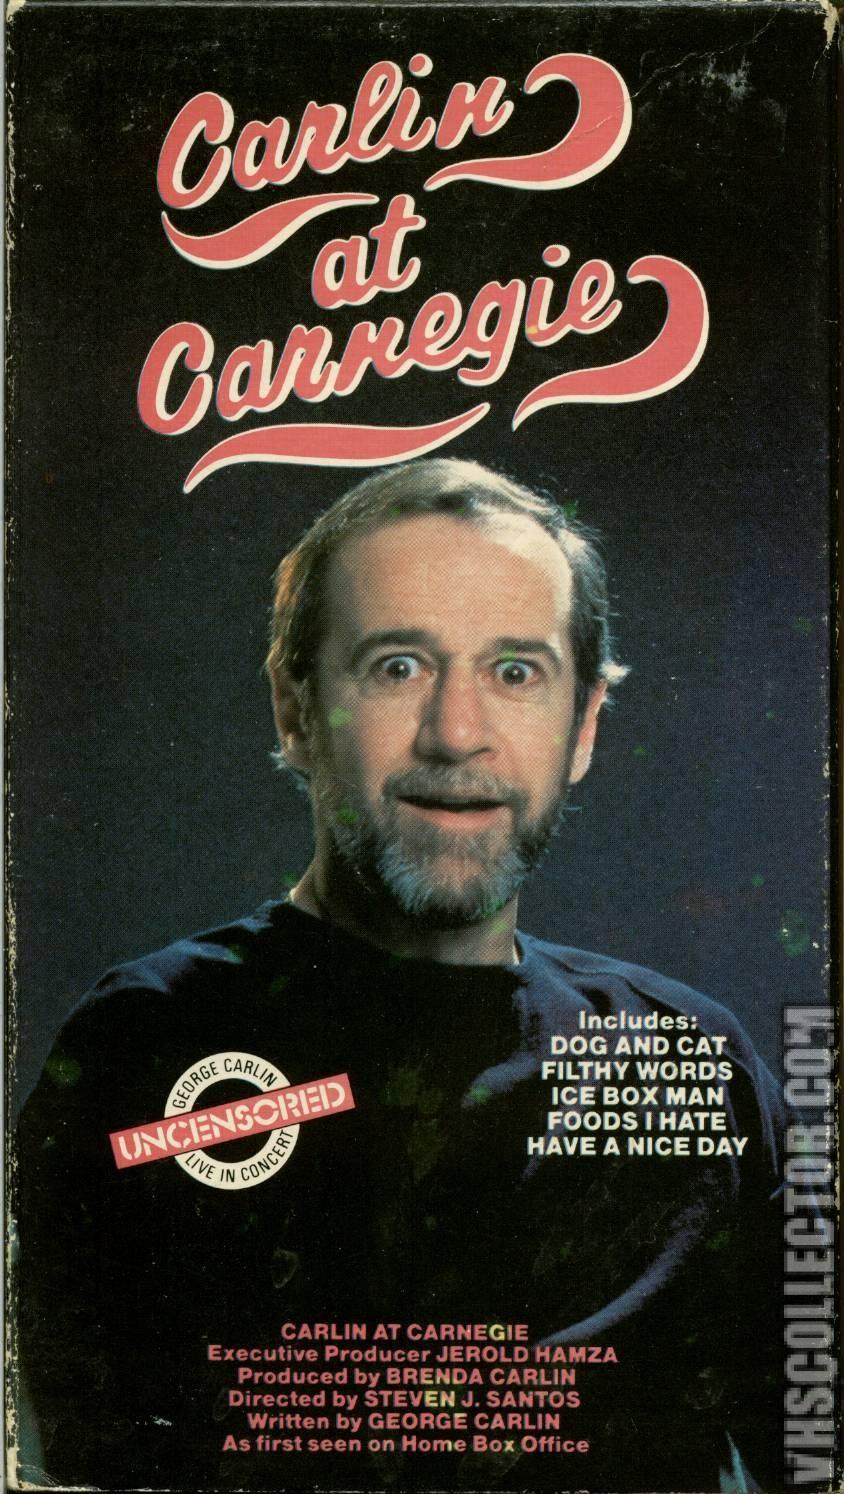 http://www.vhscollector.com/movie/carlin-carnegie